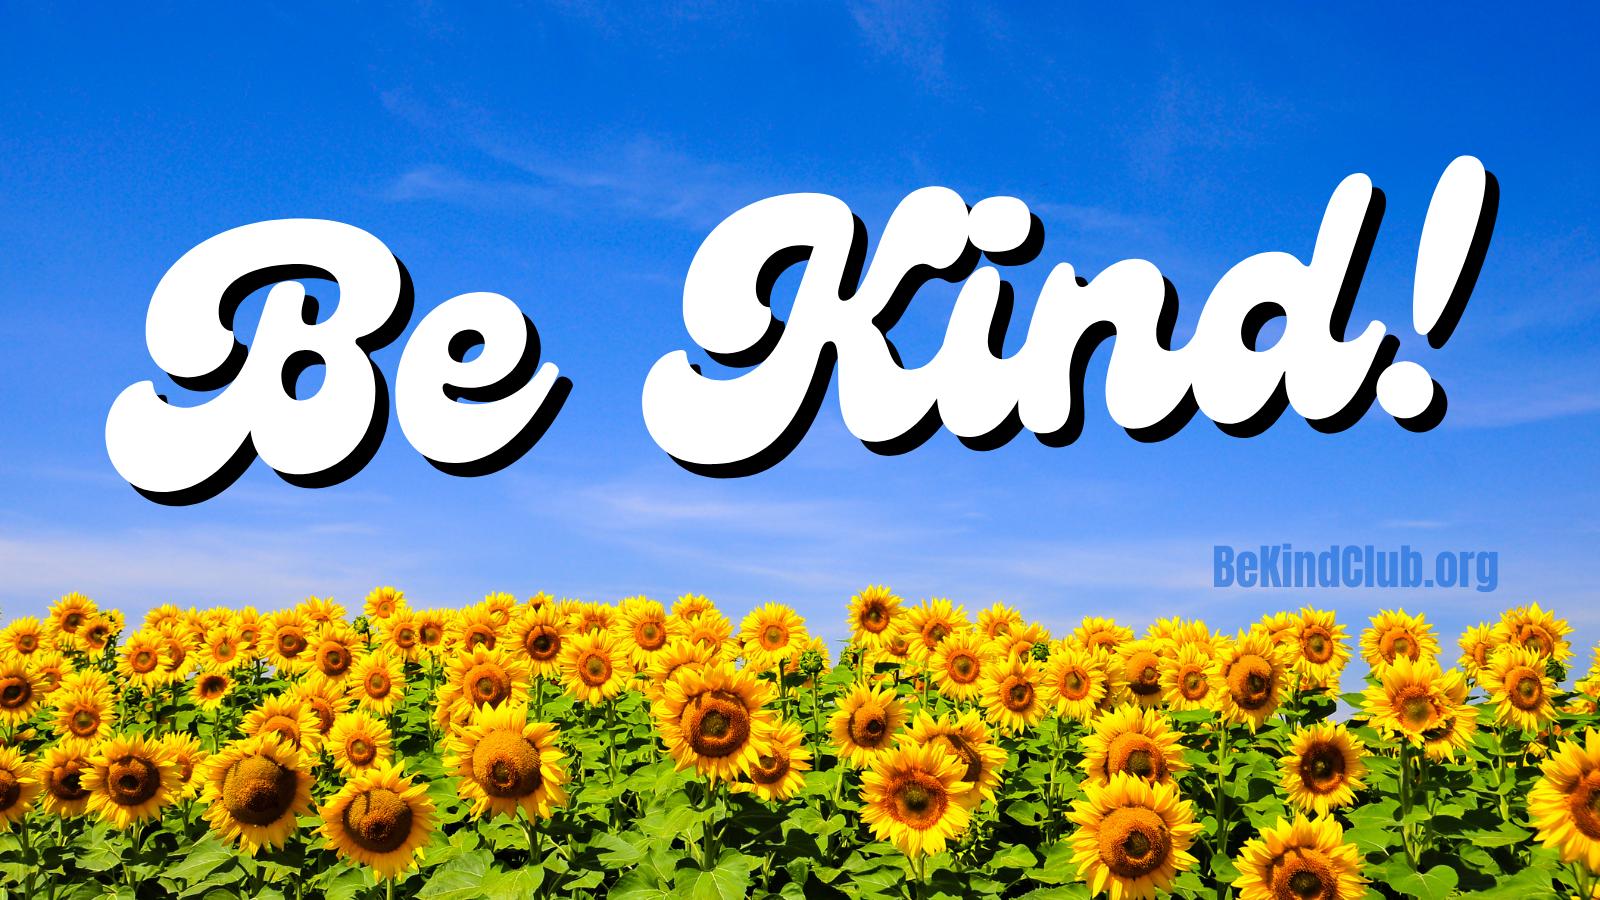 Be Kind Club